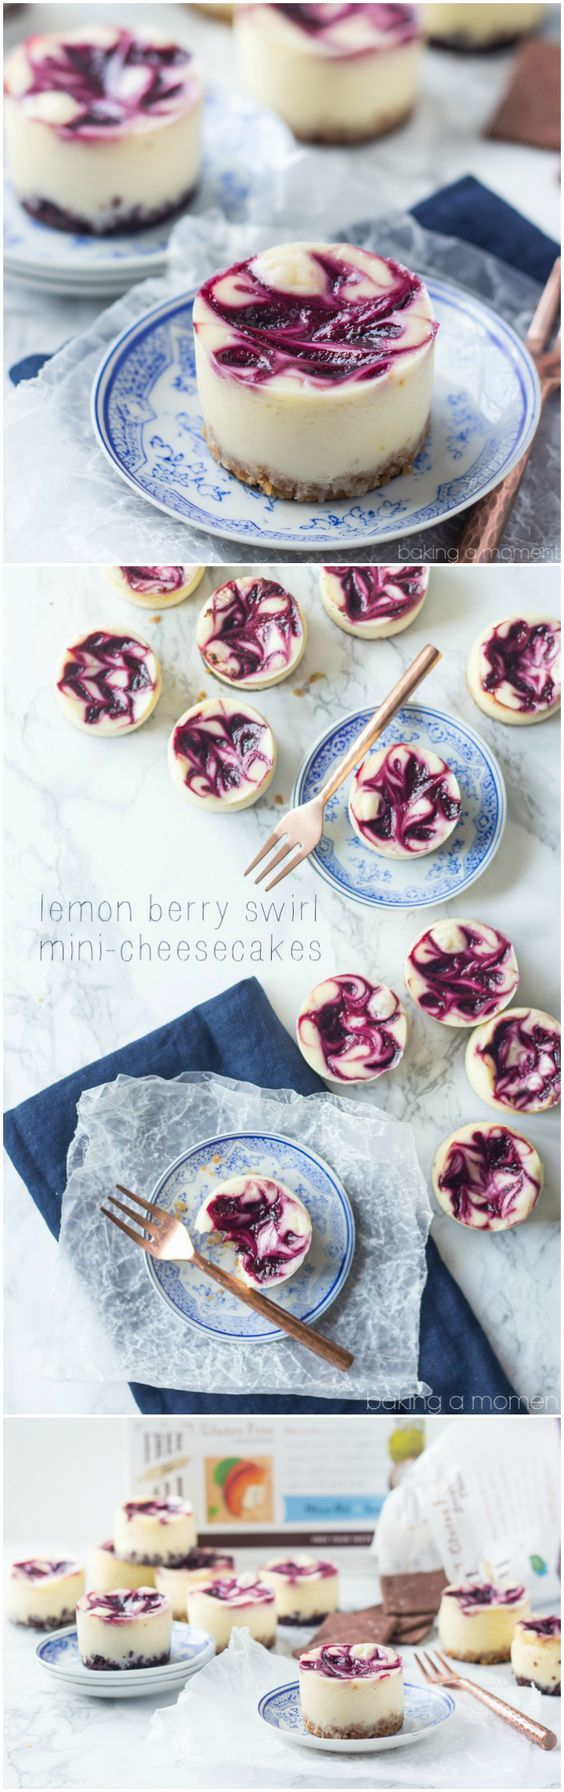 Lemon Berry Swirl Mini-Cheesecakes! So cute and completely gluten-free :)Lemon Berry Swirl Mini-Cheesecakes! So cute and completely gluten-free :)ad